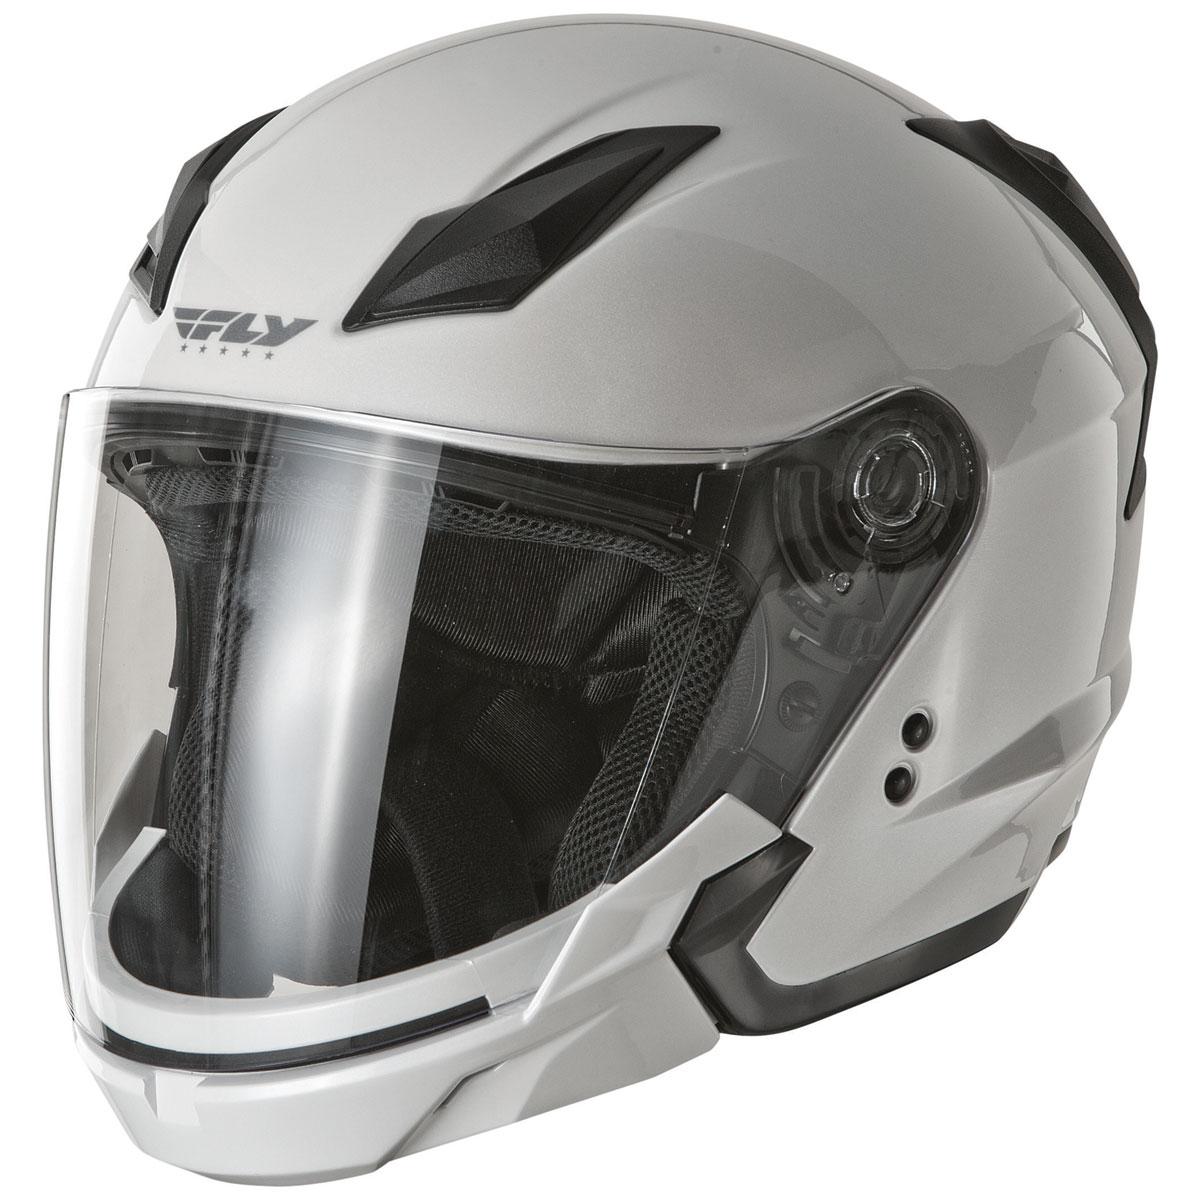 FLY Racing Street Tourist Pearl White Modular Helmet